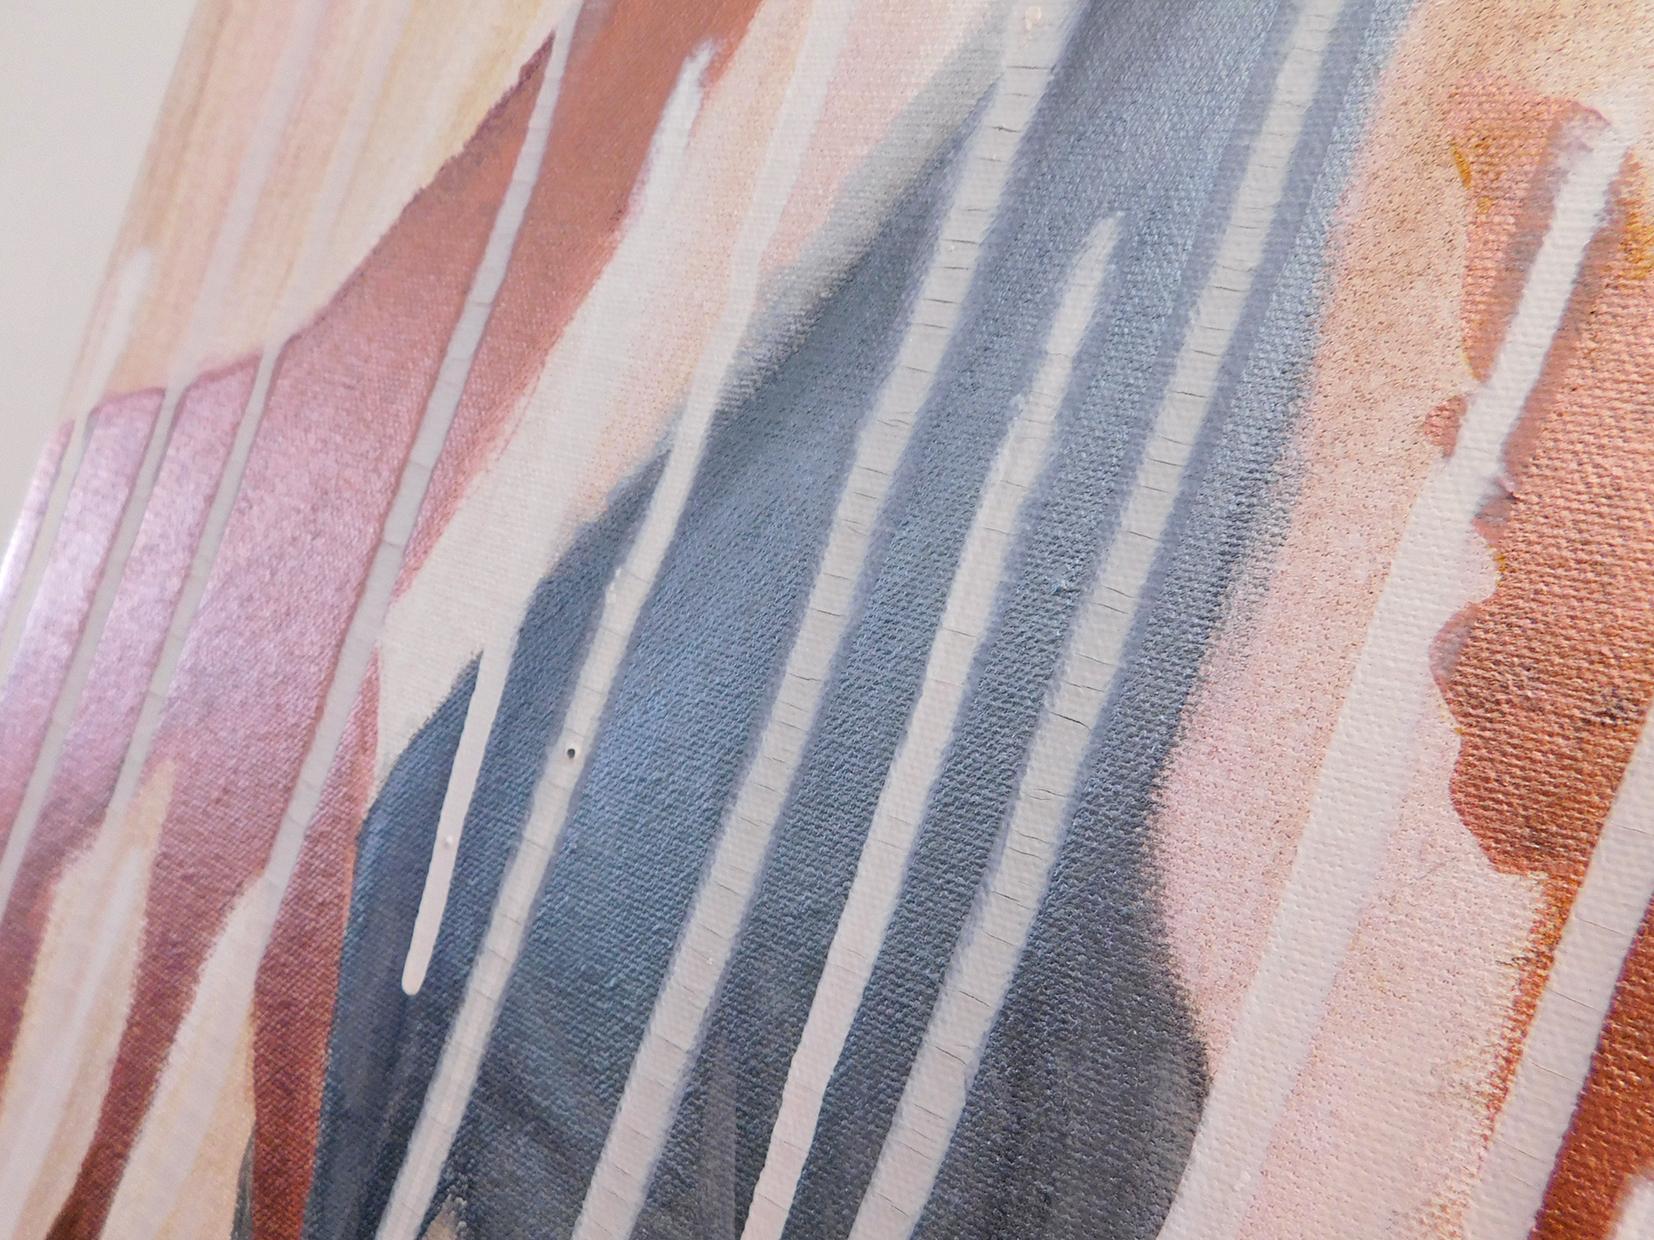 Roaming Ruminants Natalie Daghestani Art Dubai Artist BSAB3